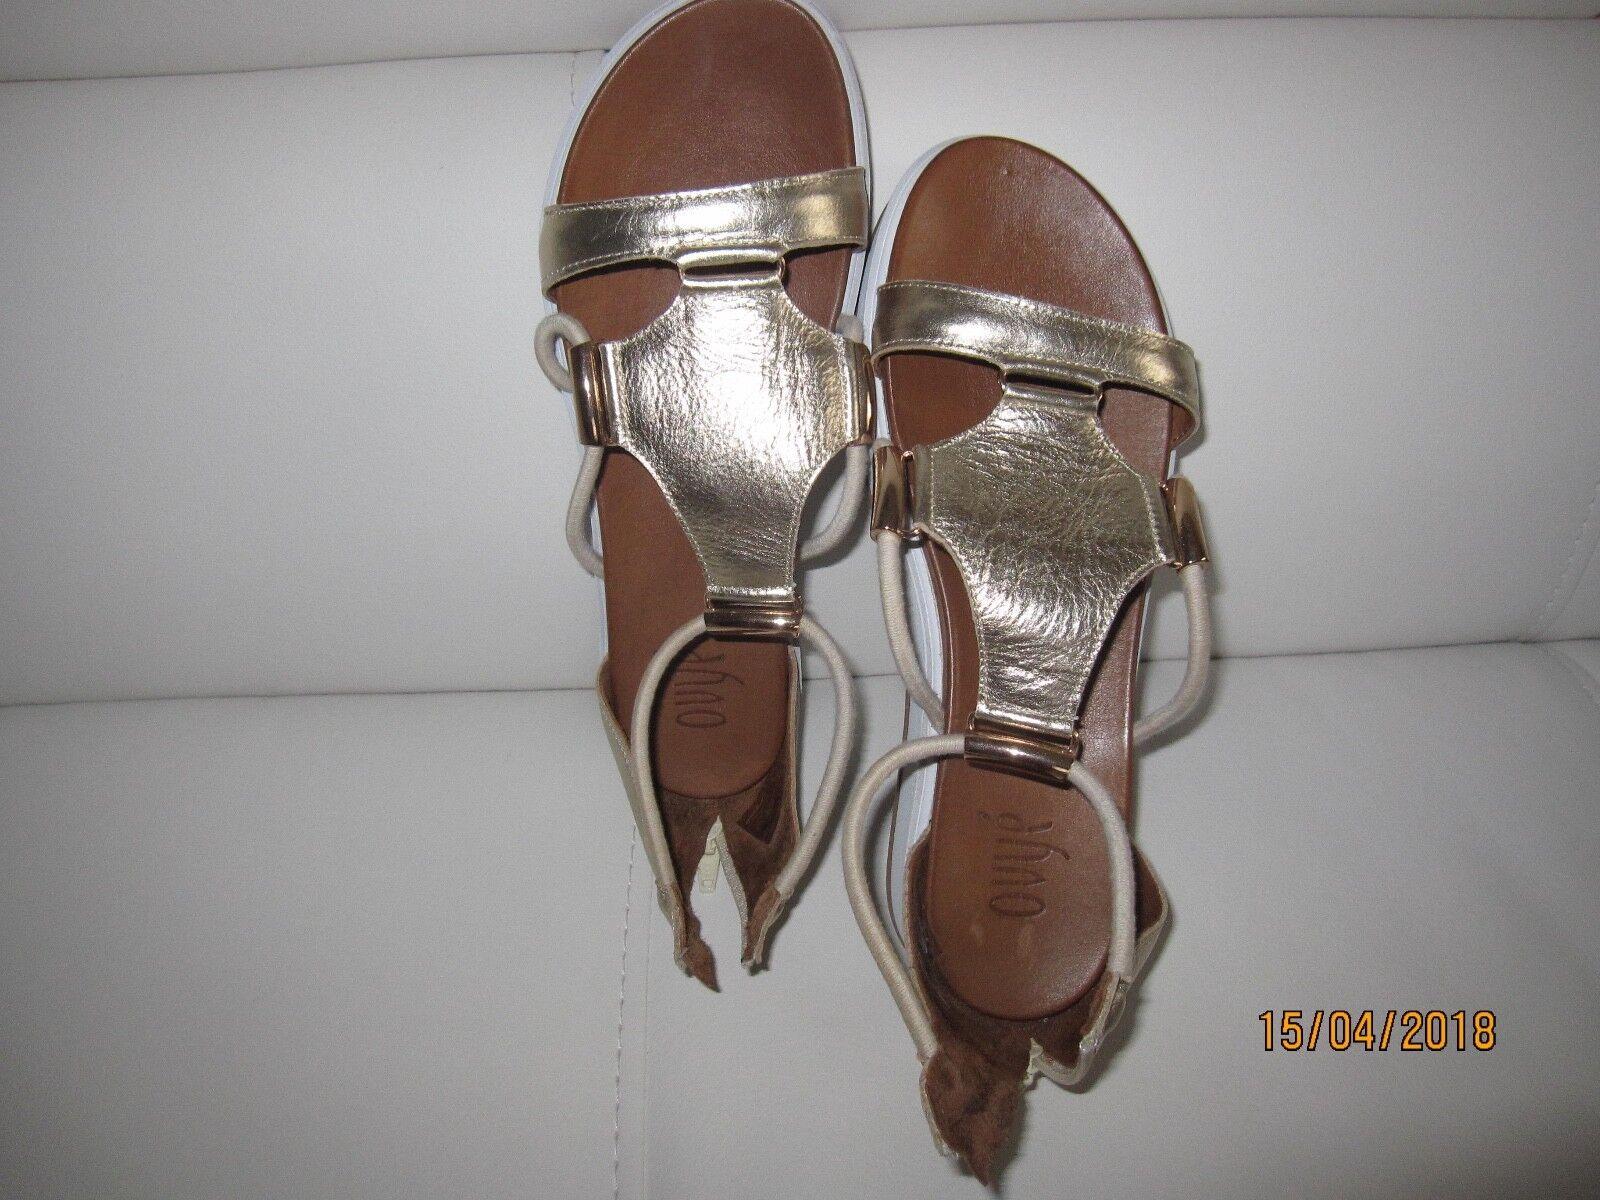 OVYE Sandale, toller Hingucker, Größe 39, Neupreis NEU